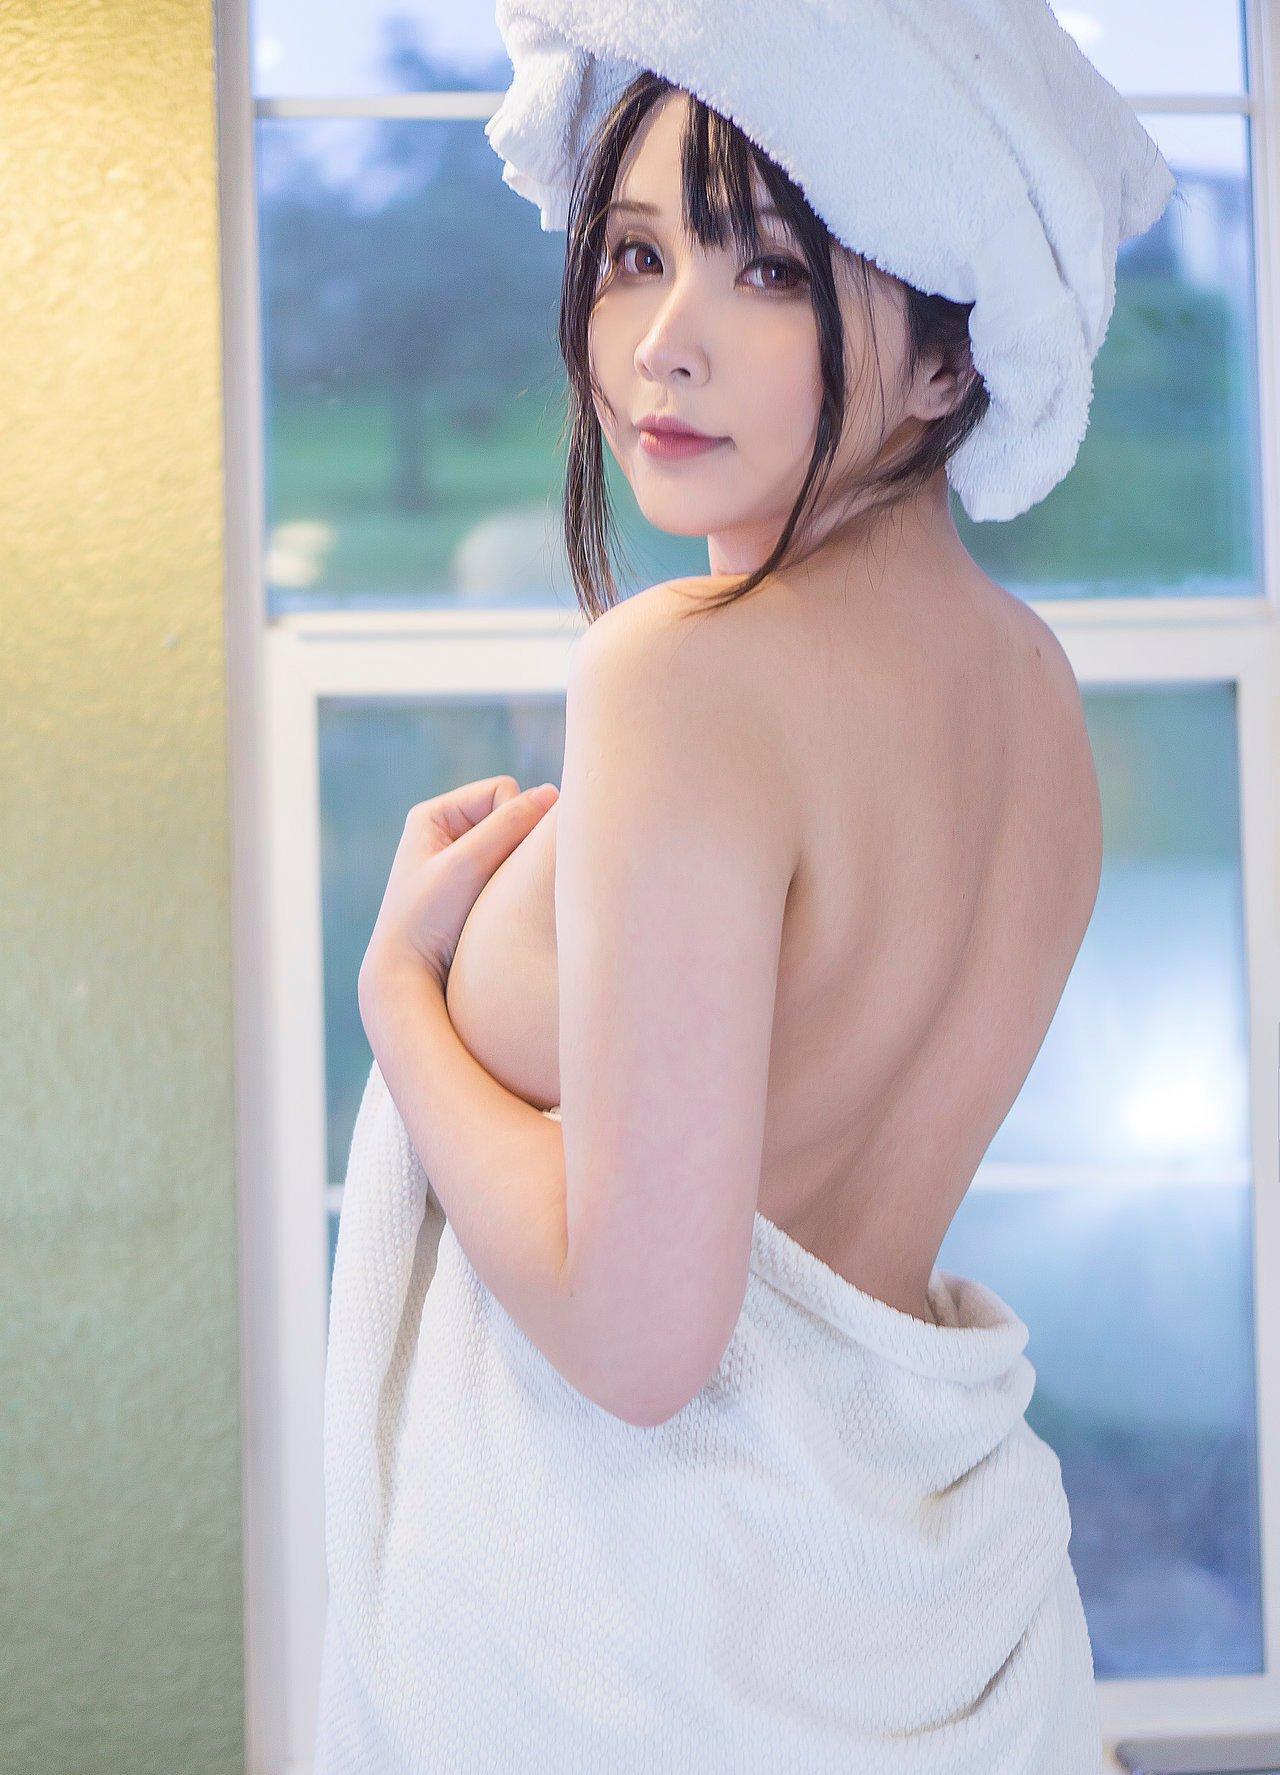 Audrey Bathtub Bunny Twitter Sexy Leaks 0004